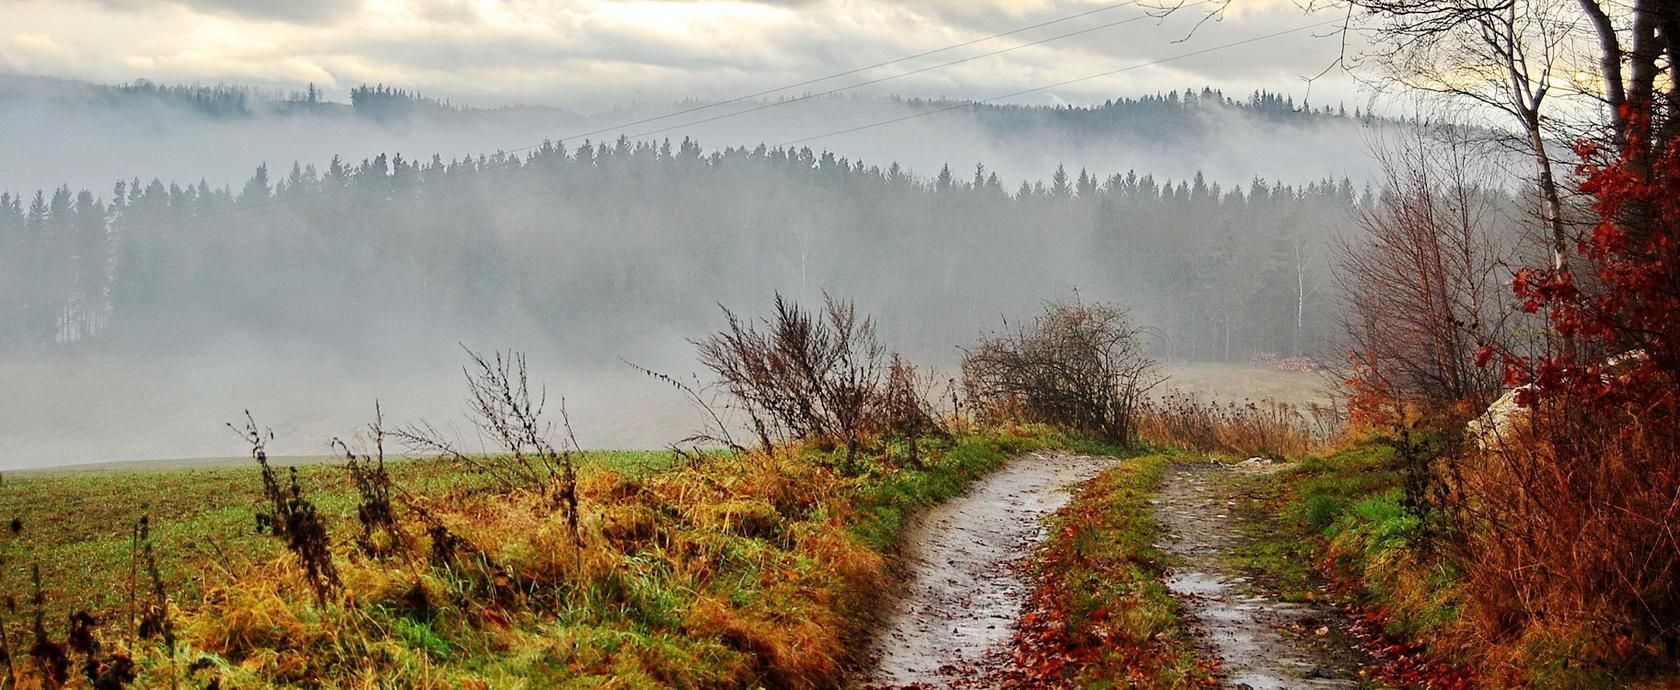 Unweit vor Boberullersdorf